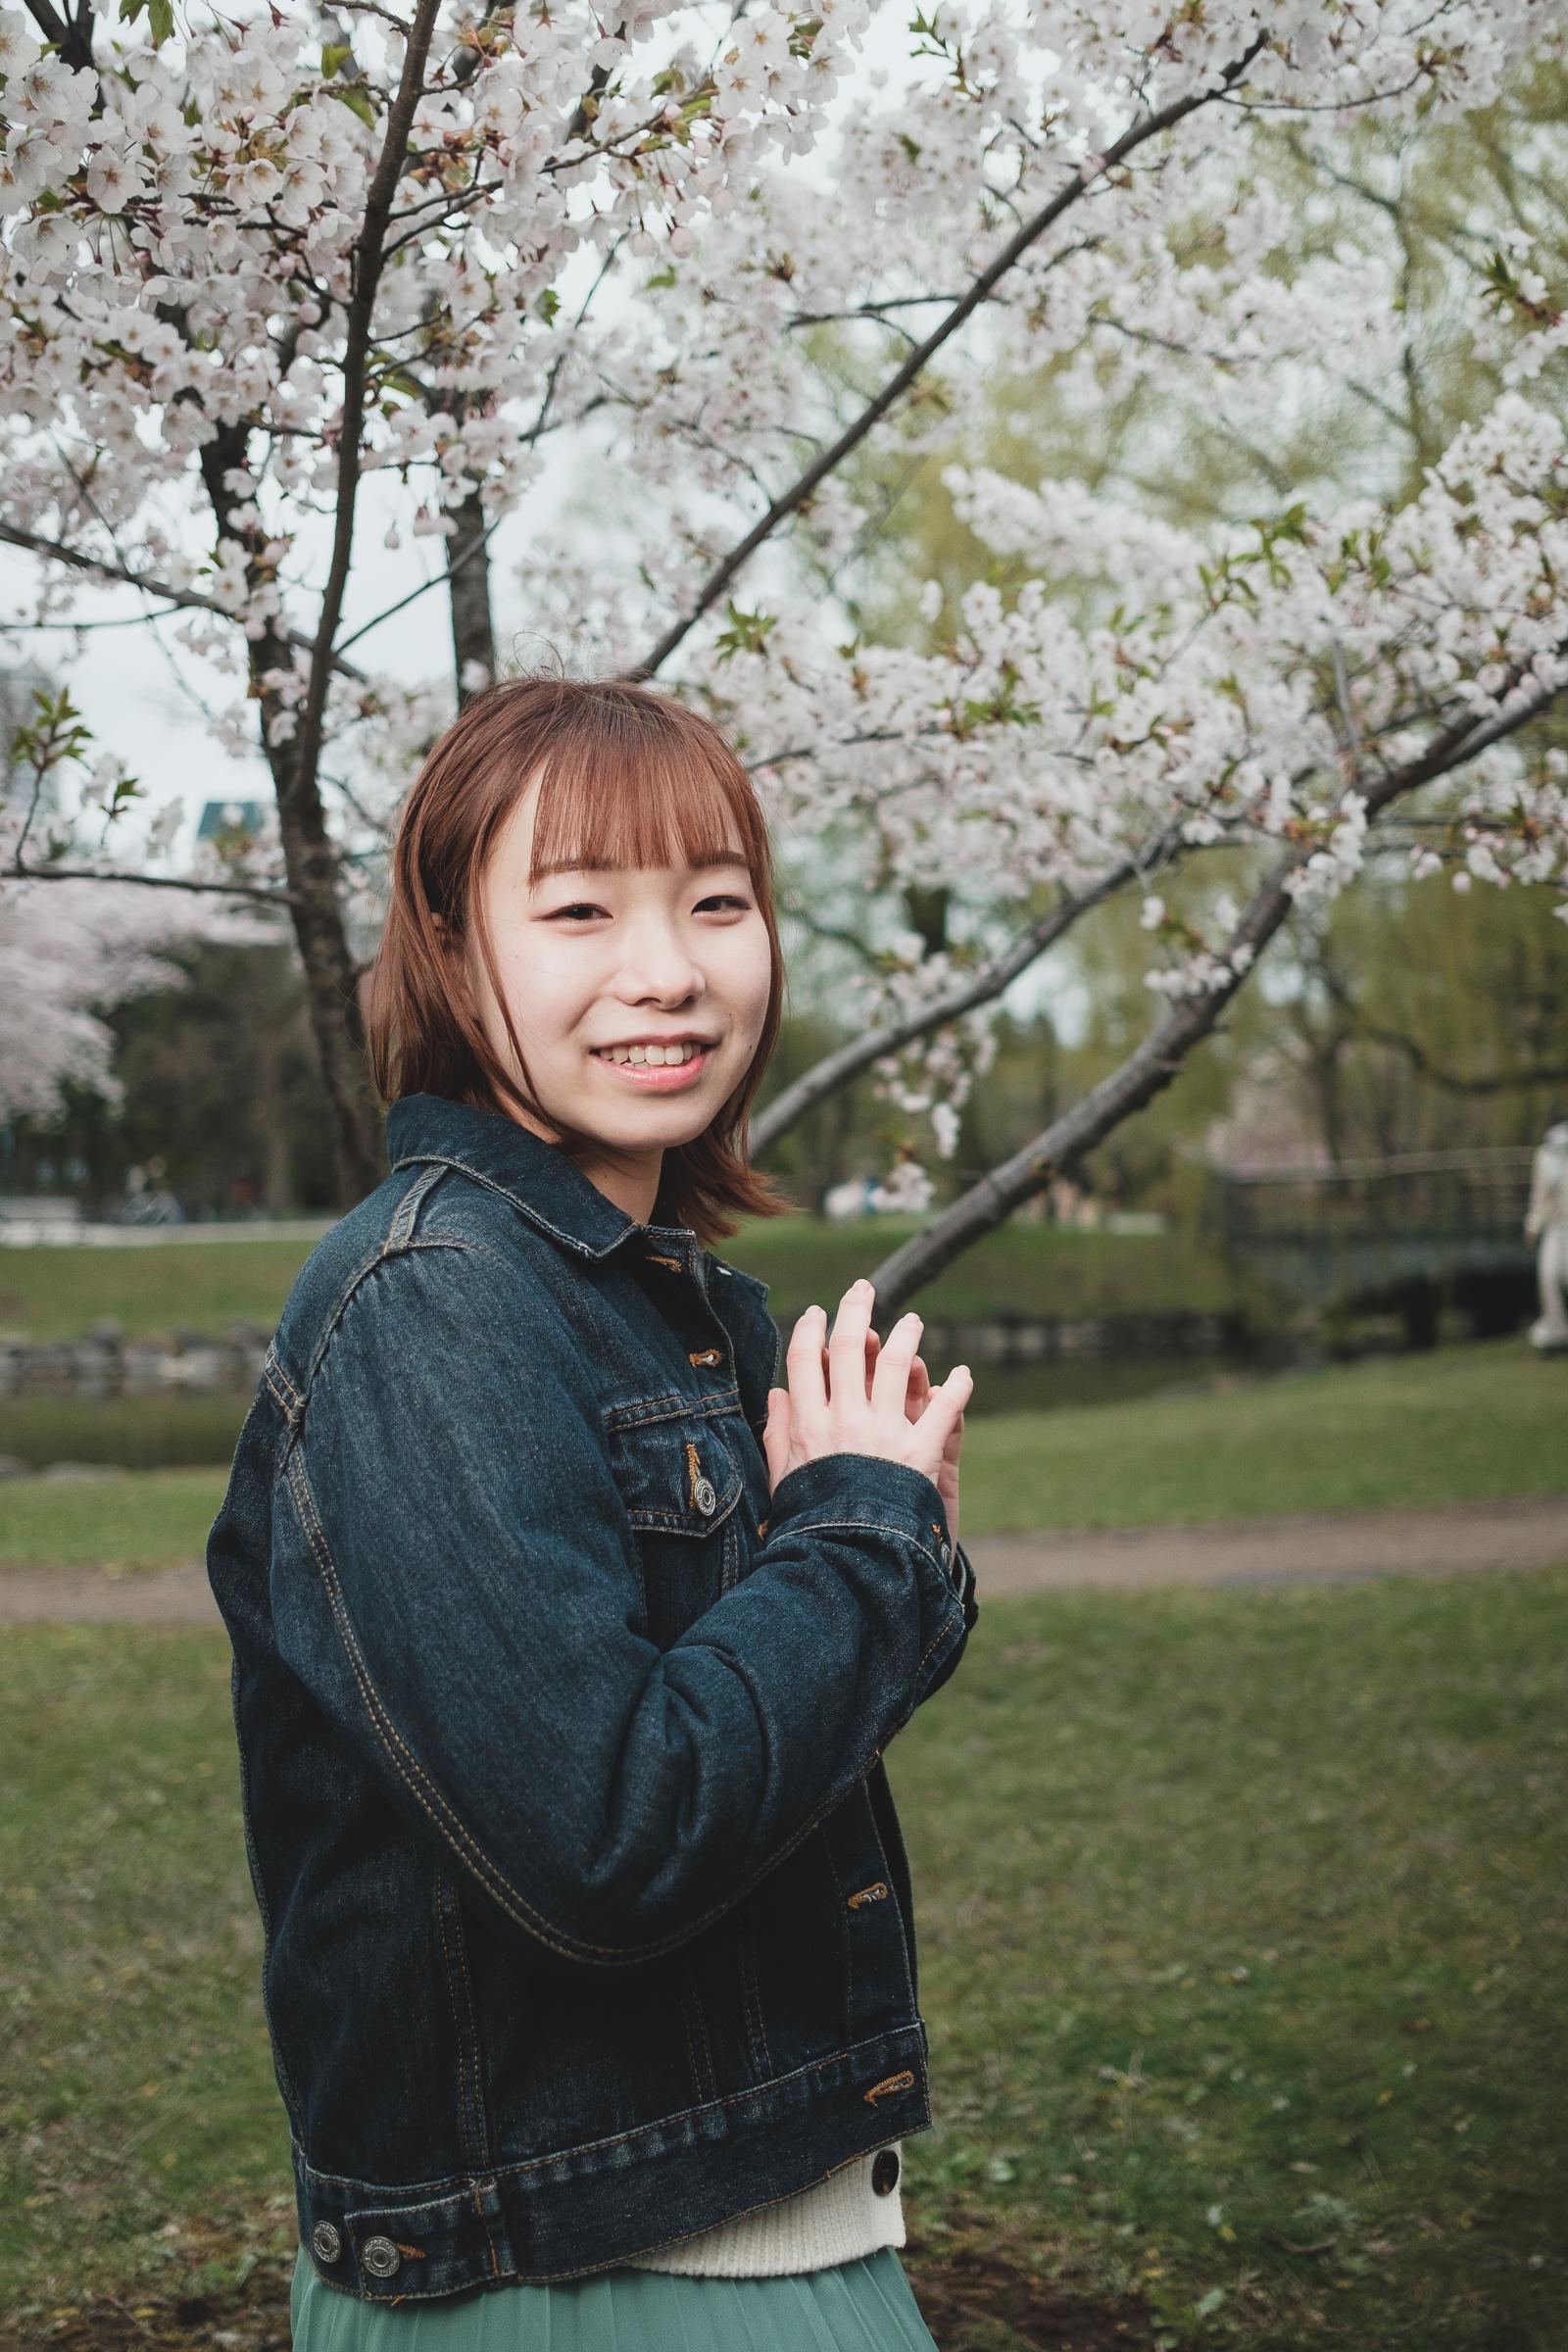 HAPPY少女♪ やよたん ( 藤本やよい ) | SMP 札幌モデルプロ「桜」撮影会 at 中島公園